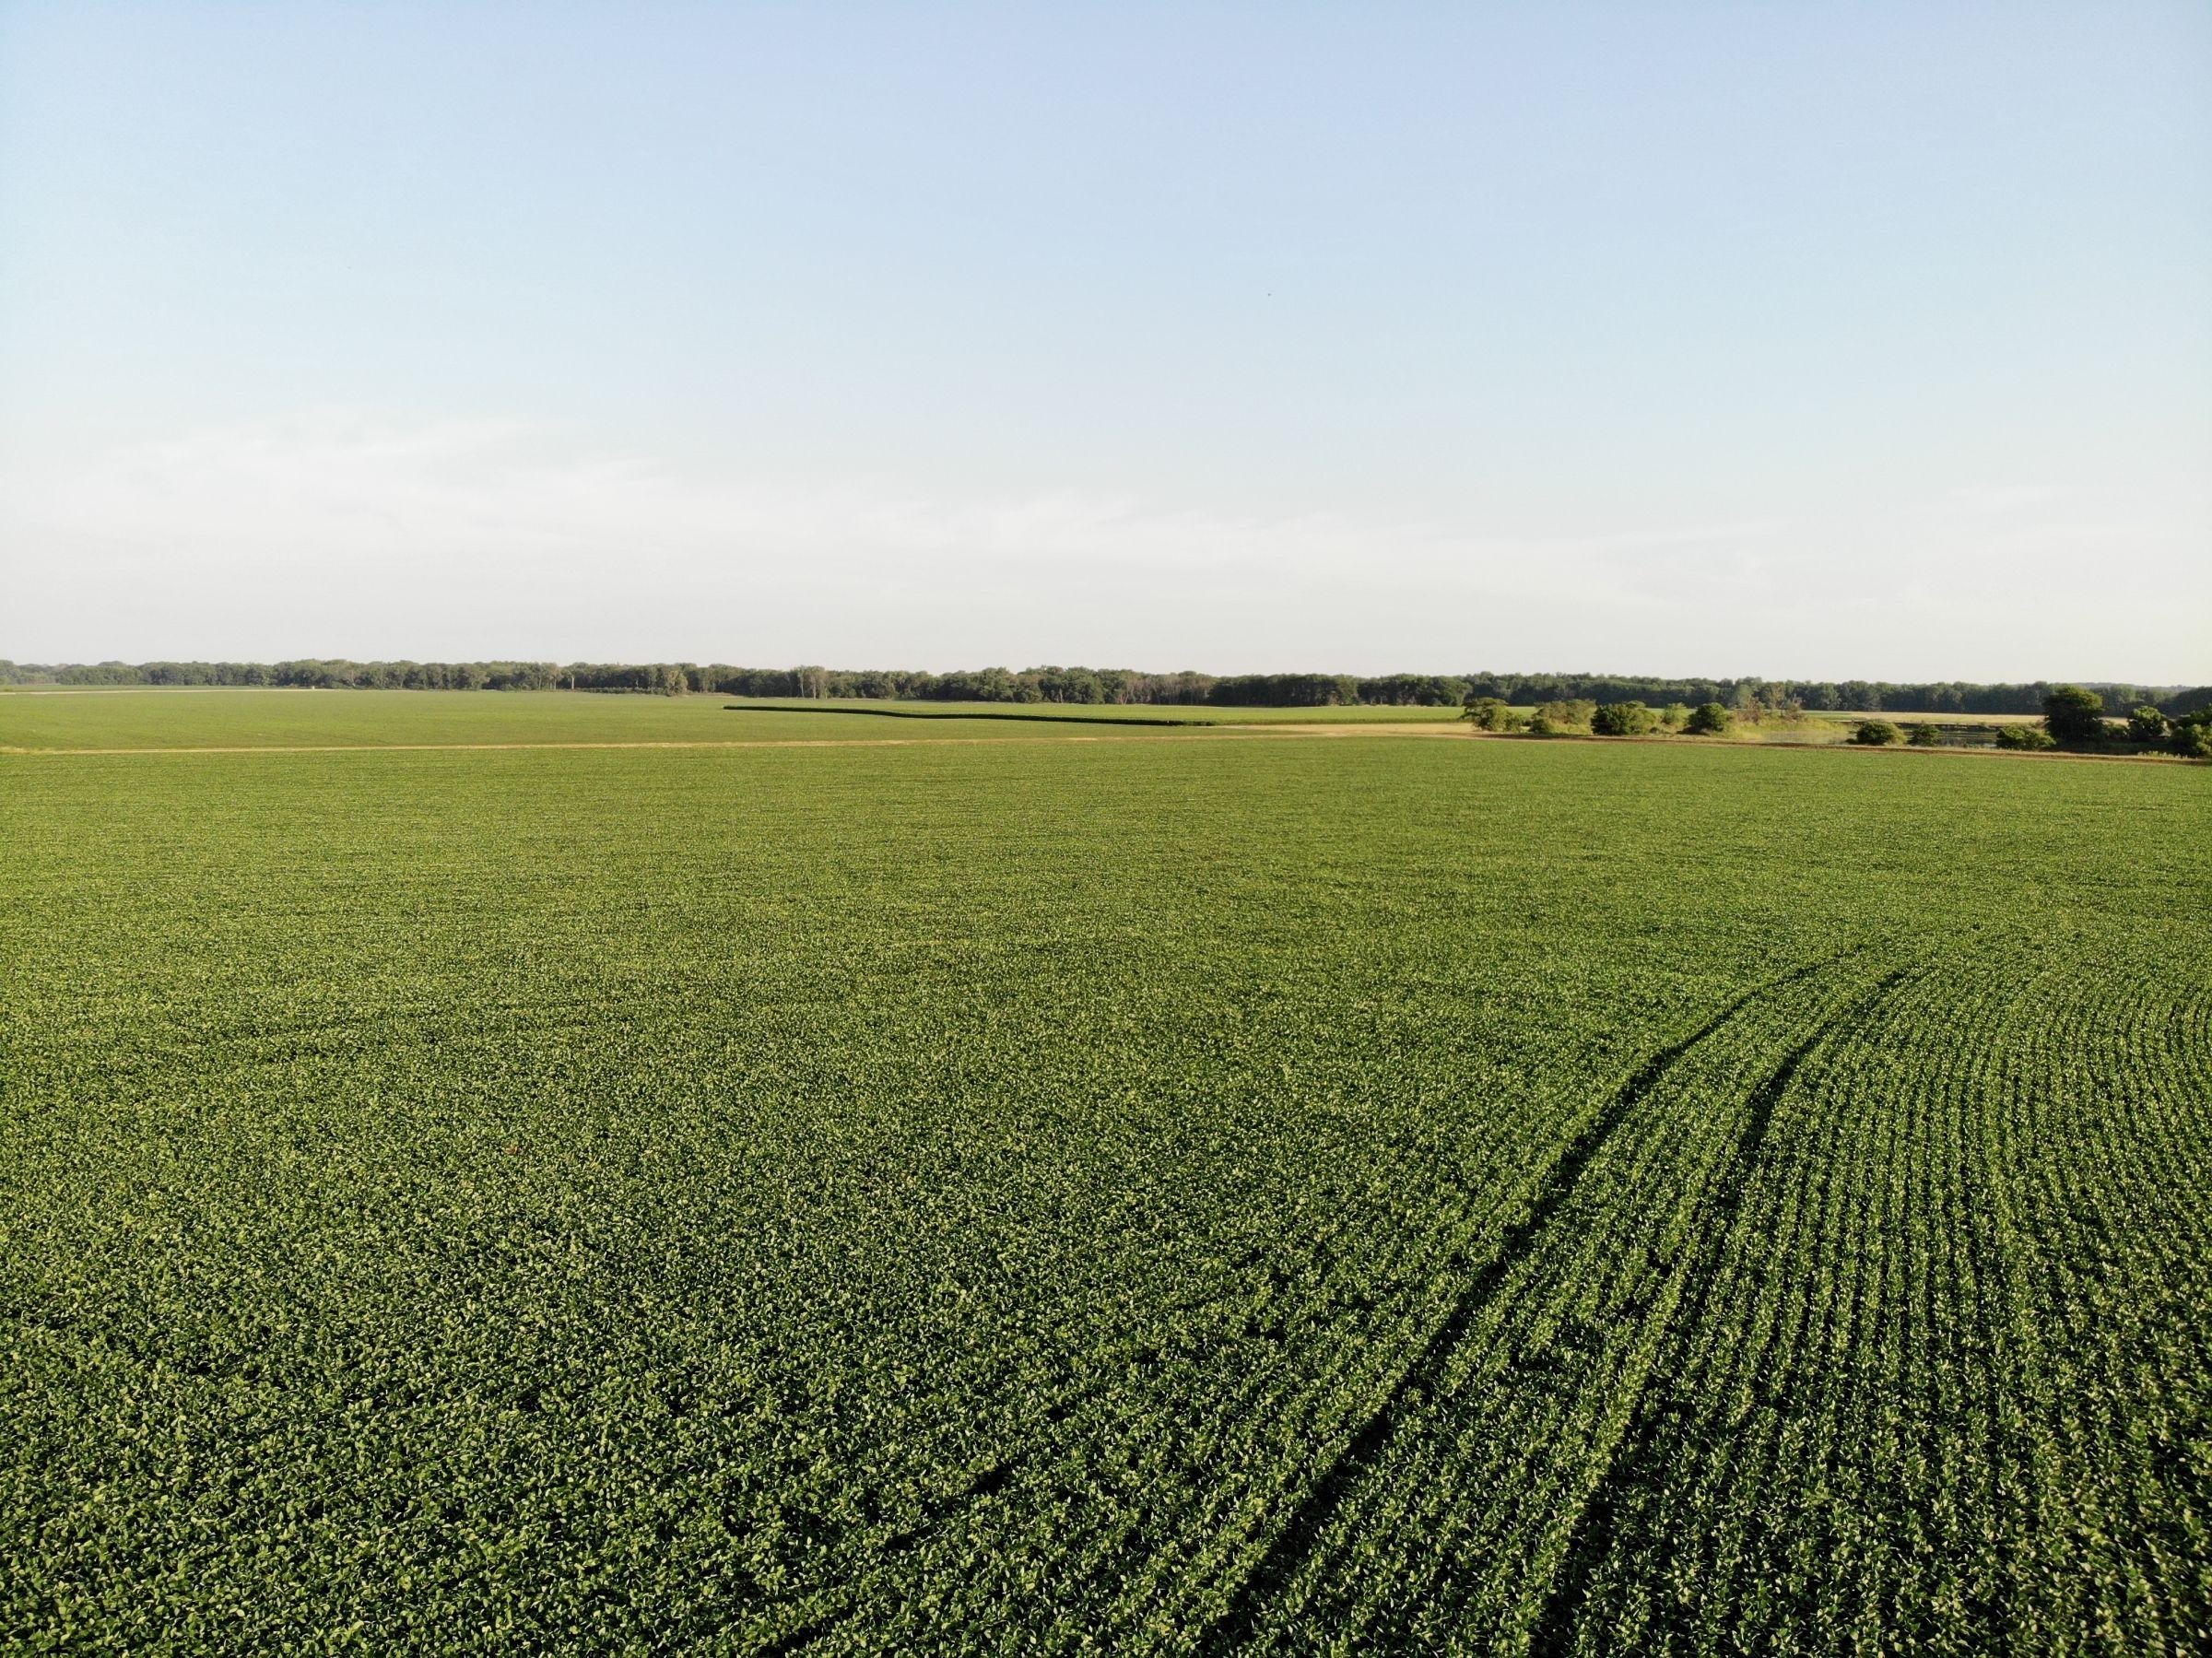 land-warren-county-iowa-27-acres-listing-number-15624-0-2021-07-07-142715.jpg